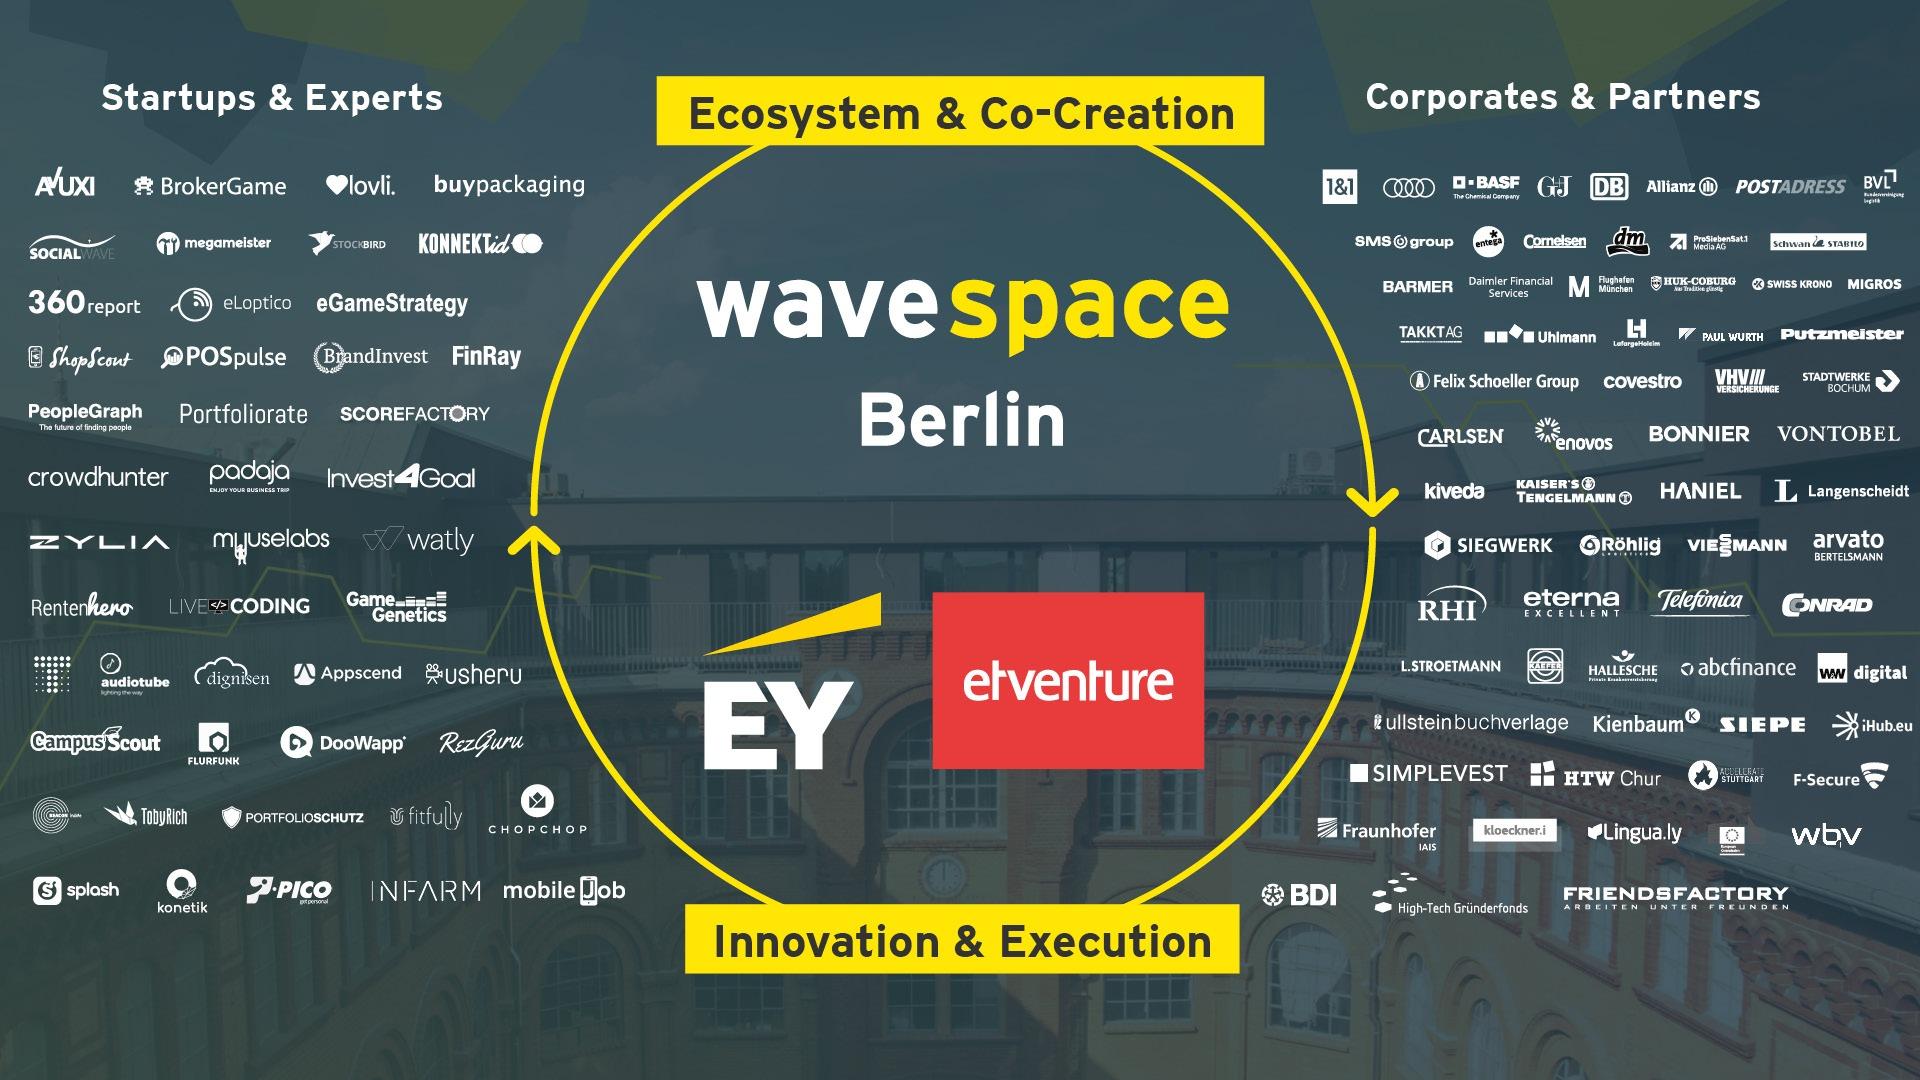 ecosystem & Co-Creation